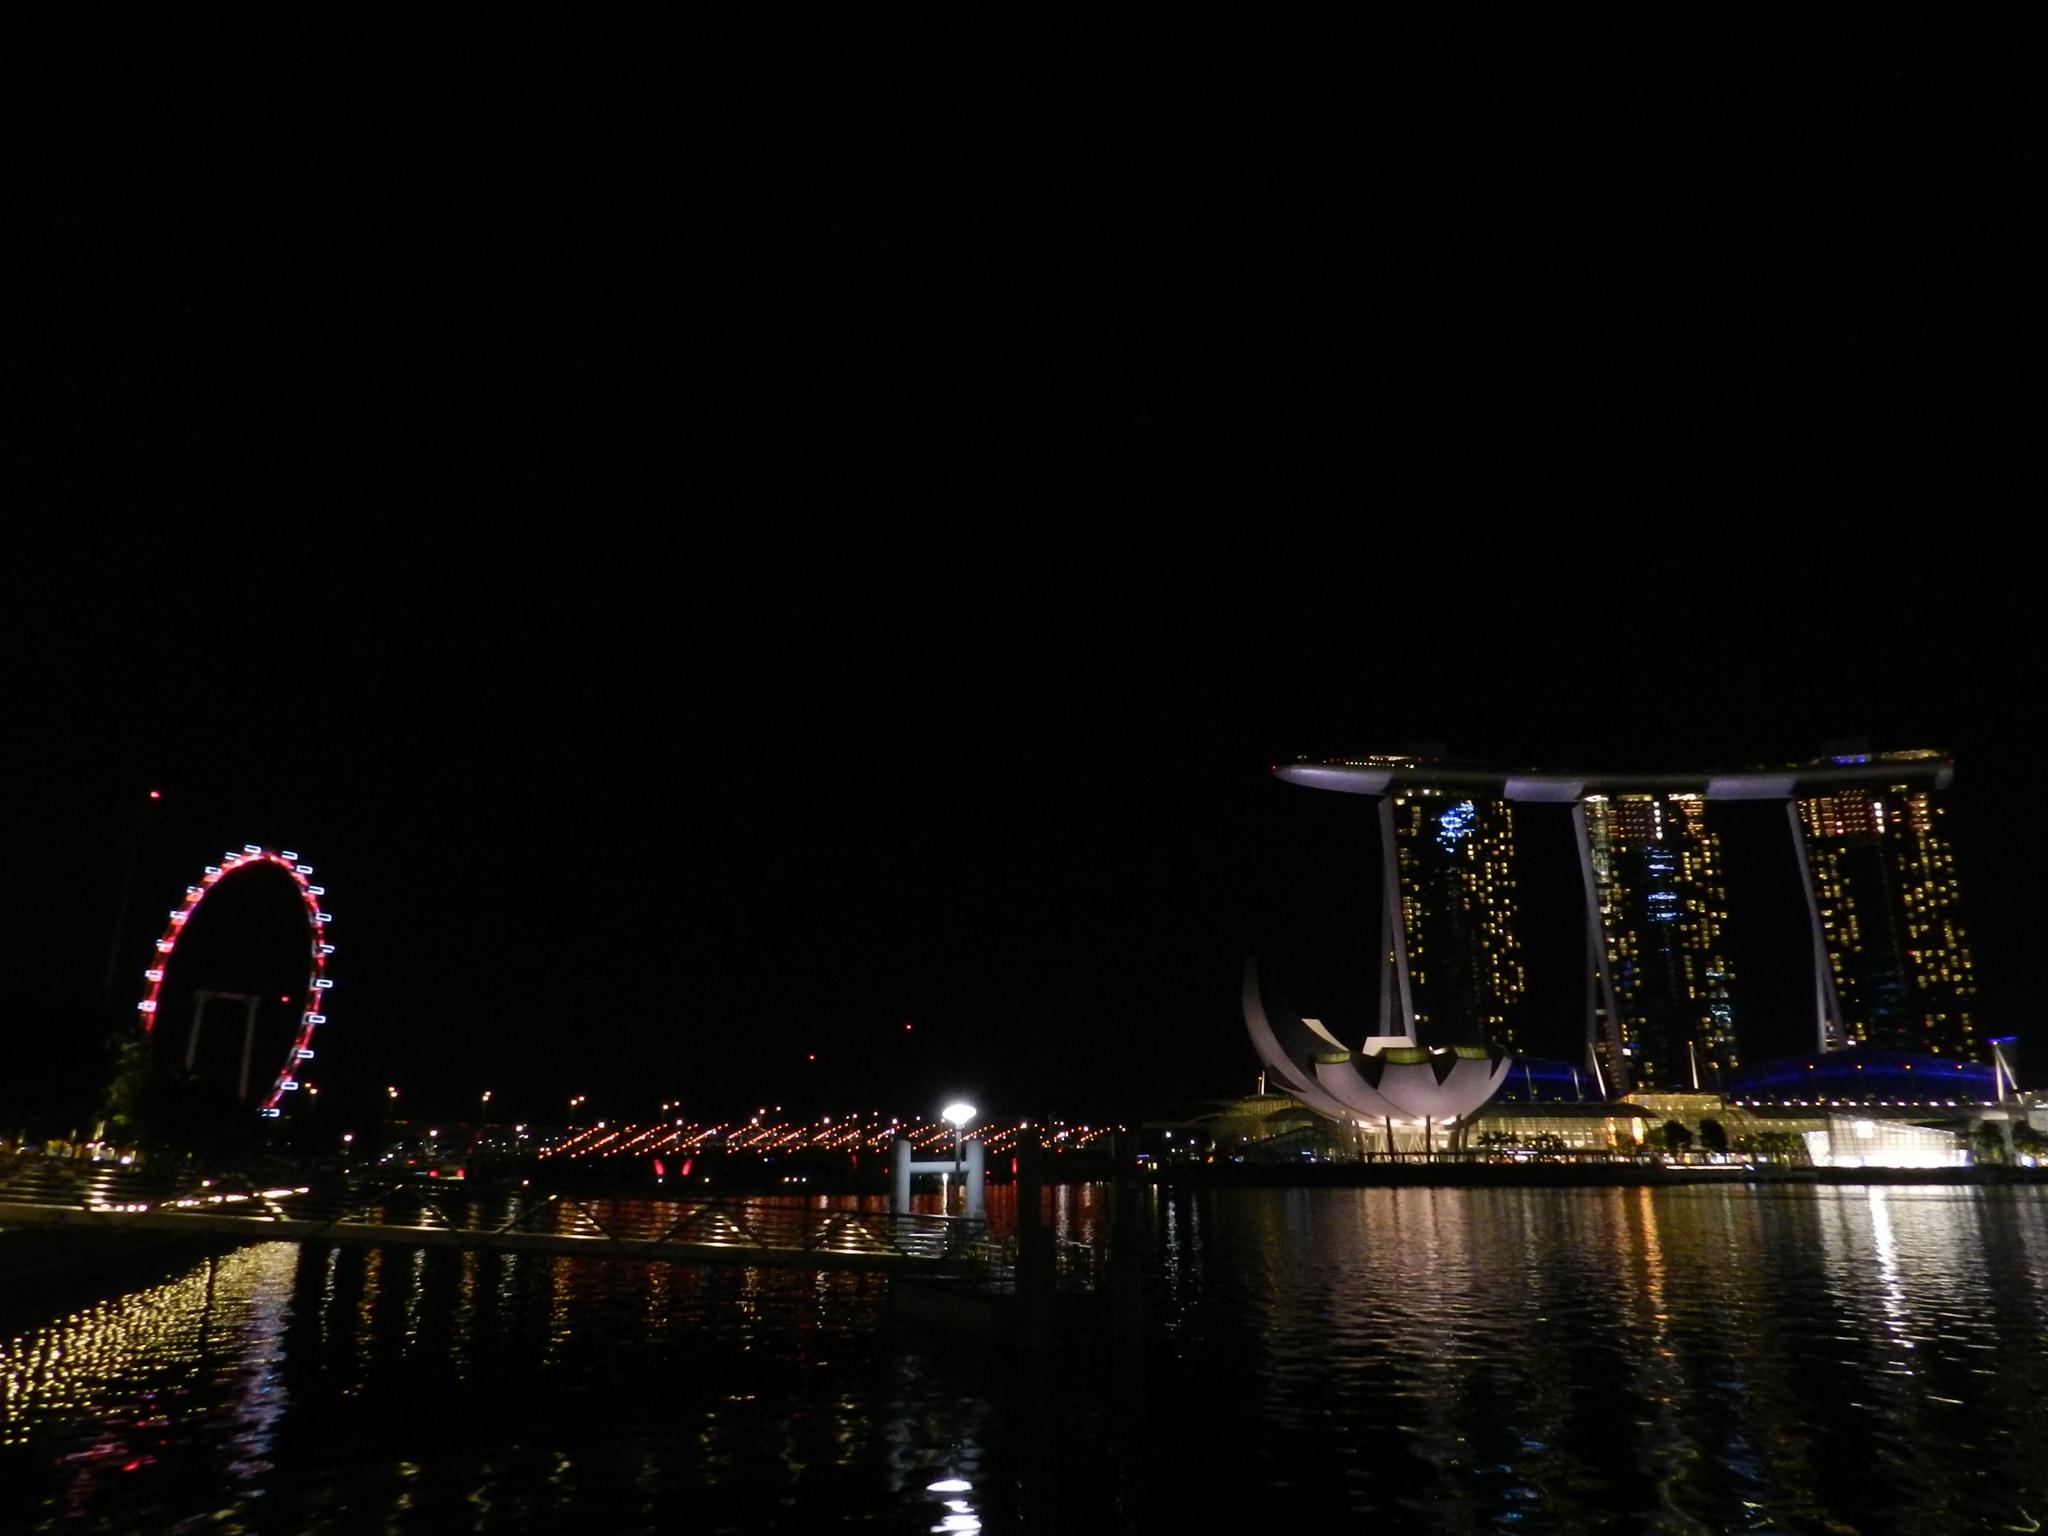 Singapore by night by Shrenik Dodhia